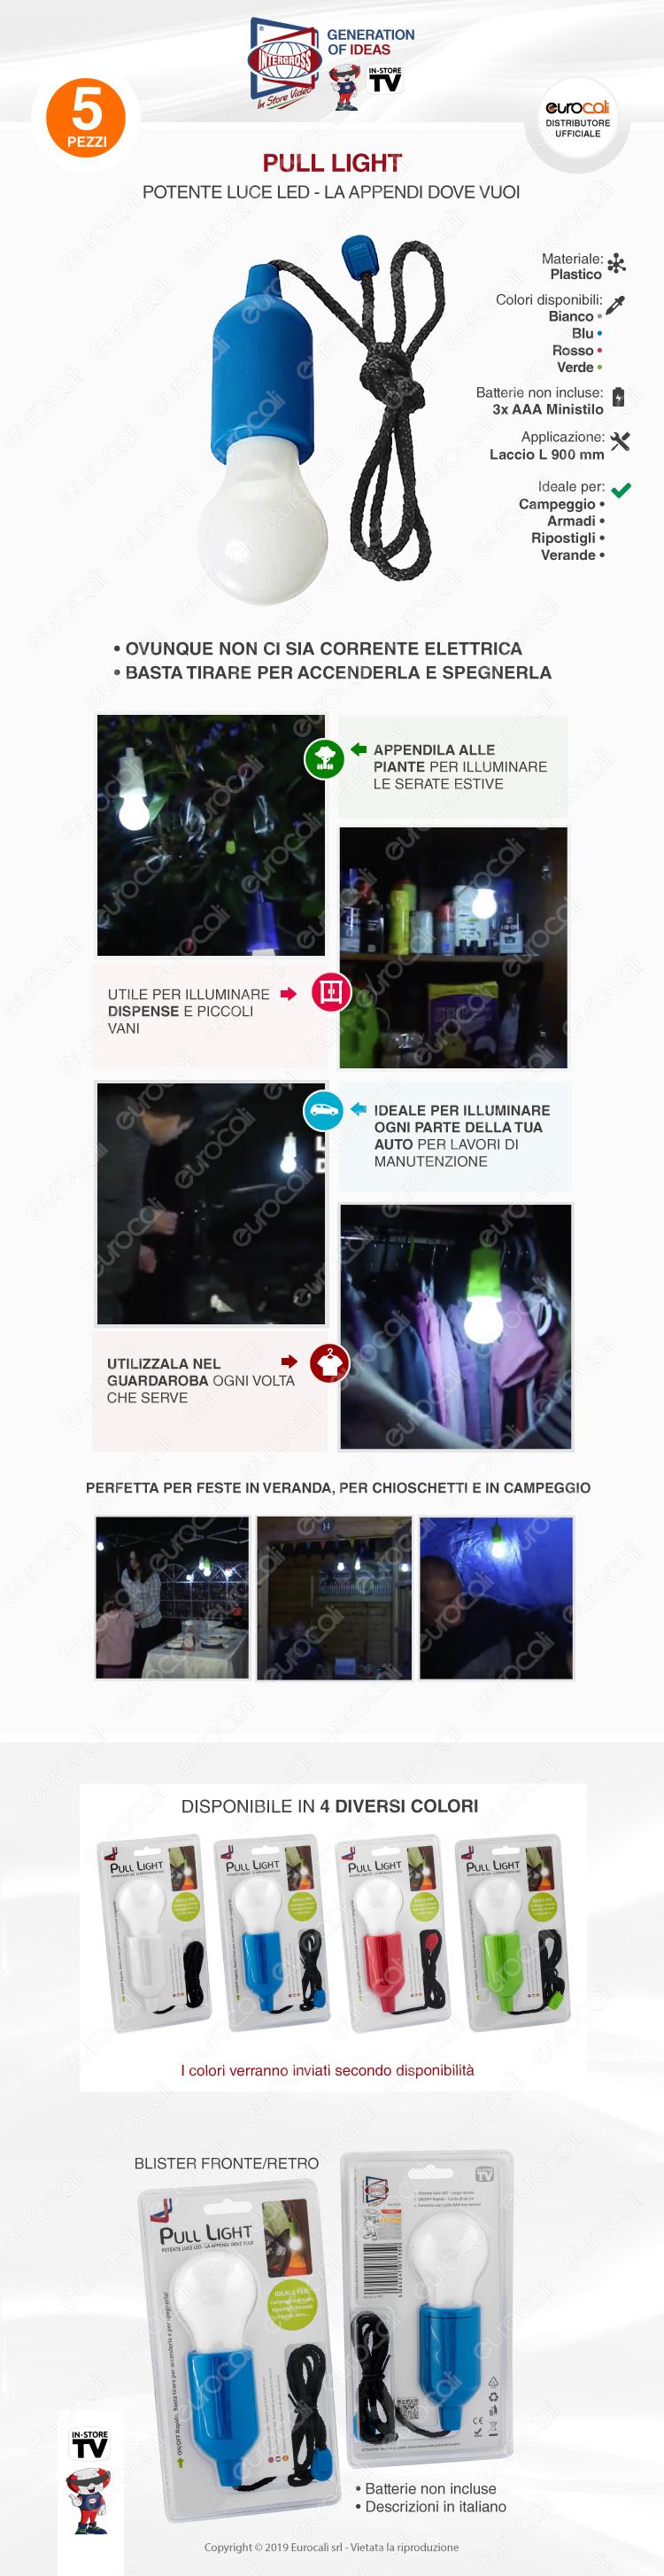 Lampadina LED Senza Fili a Batteria da Appendere Kit 5 Intergross Pull Light